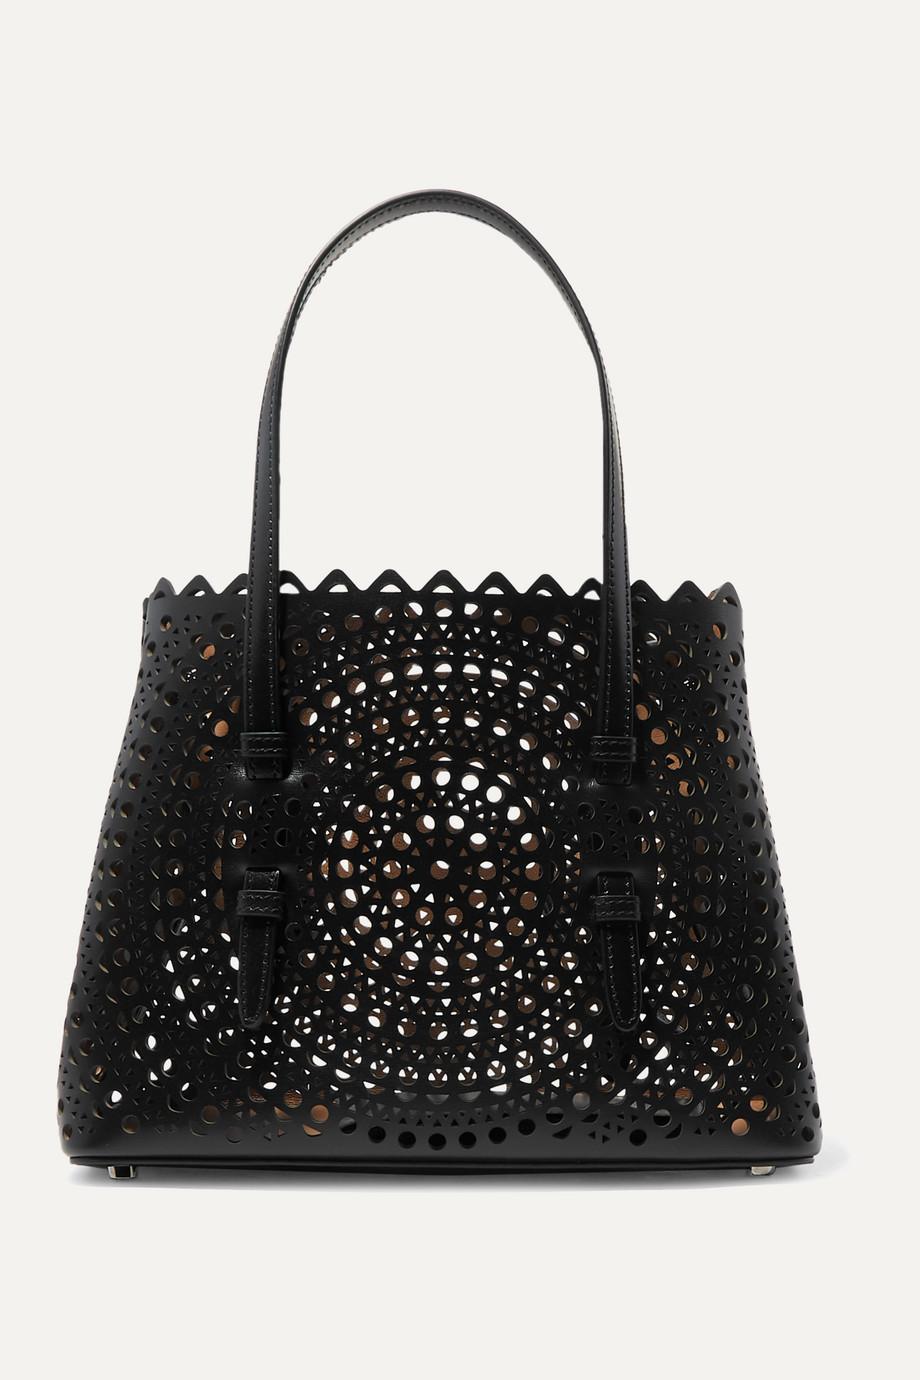 Alaïa Mina small laser-cut leather tote